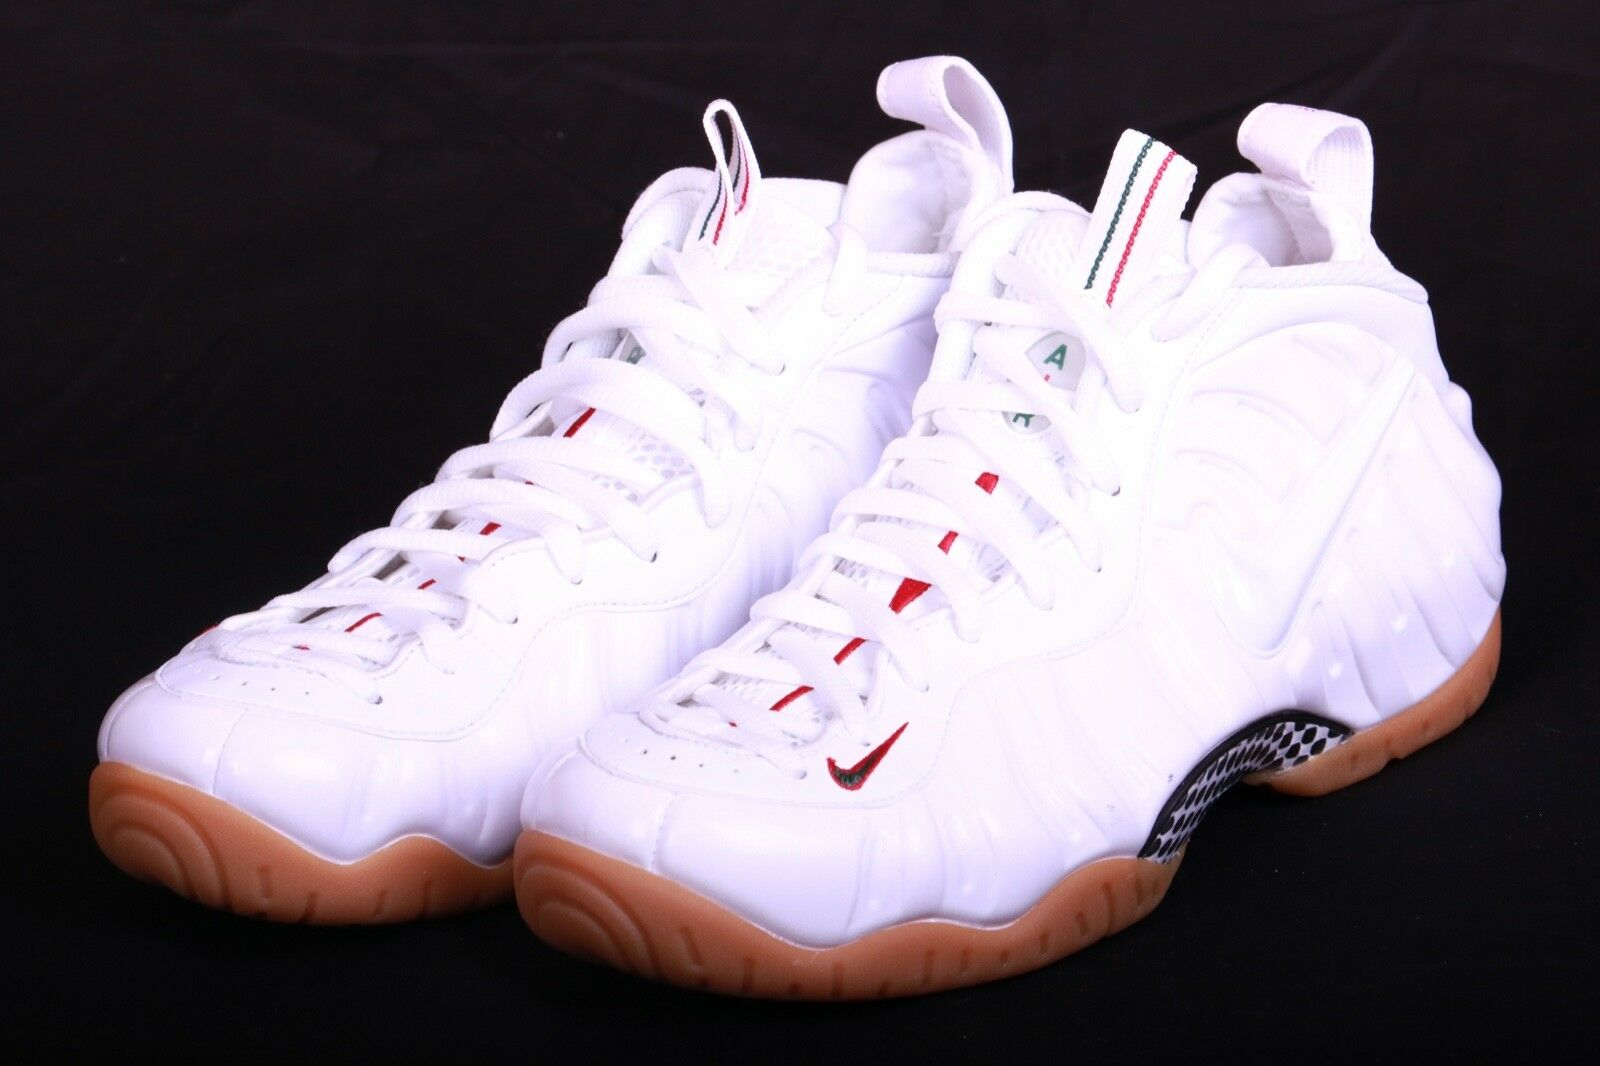 7ba2c62848a Nike Air Foamposite Pro Size 9.5 Mens Winter White Foams 624041 102 ...